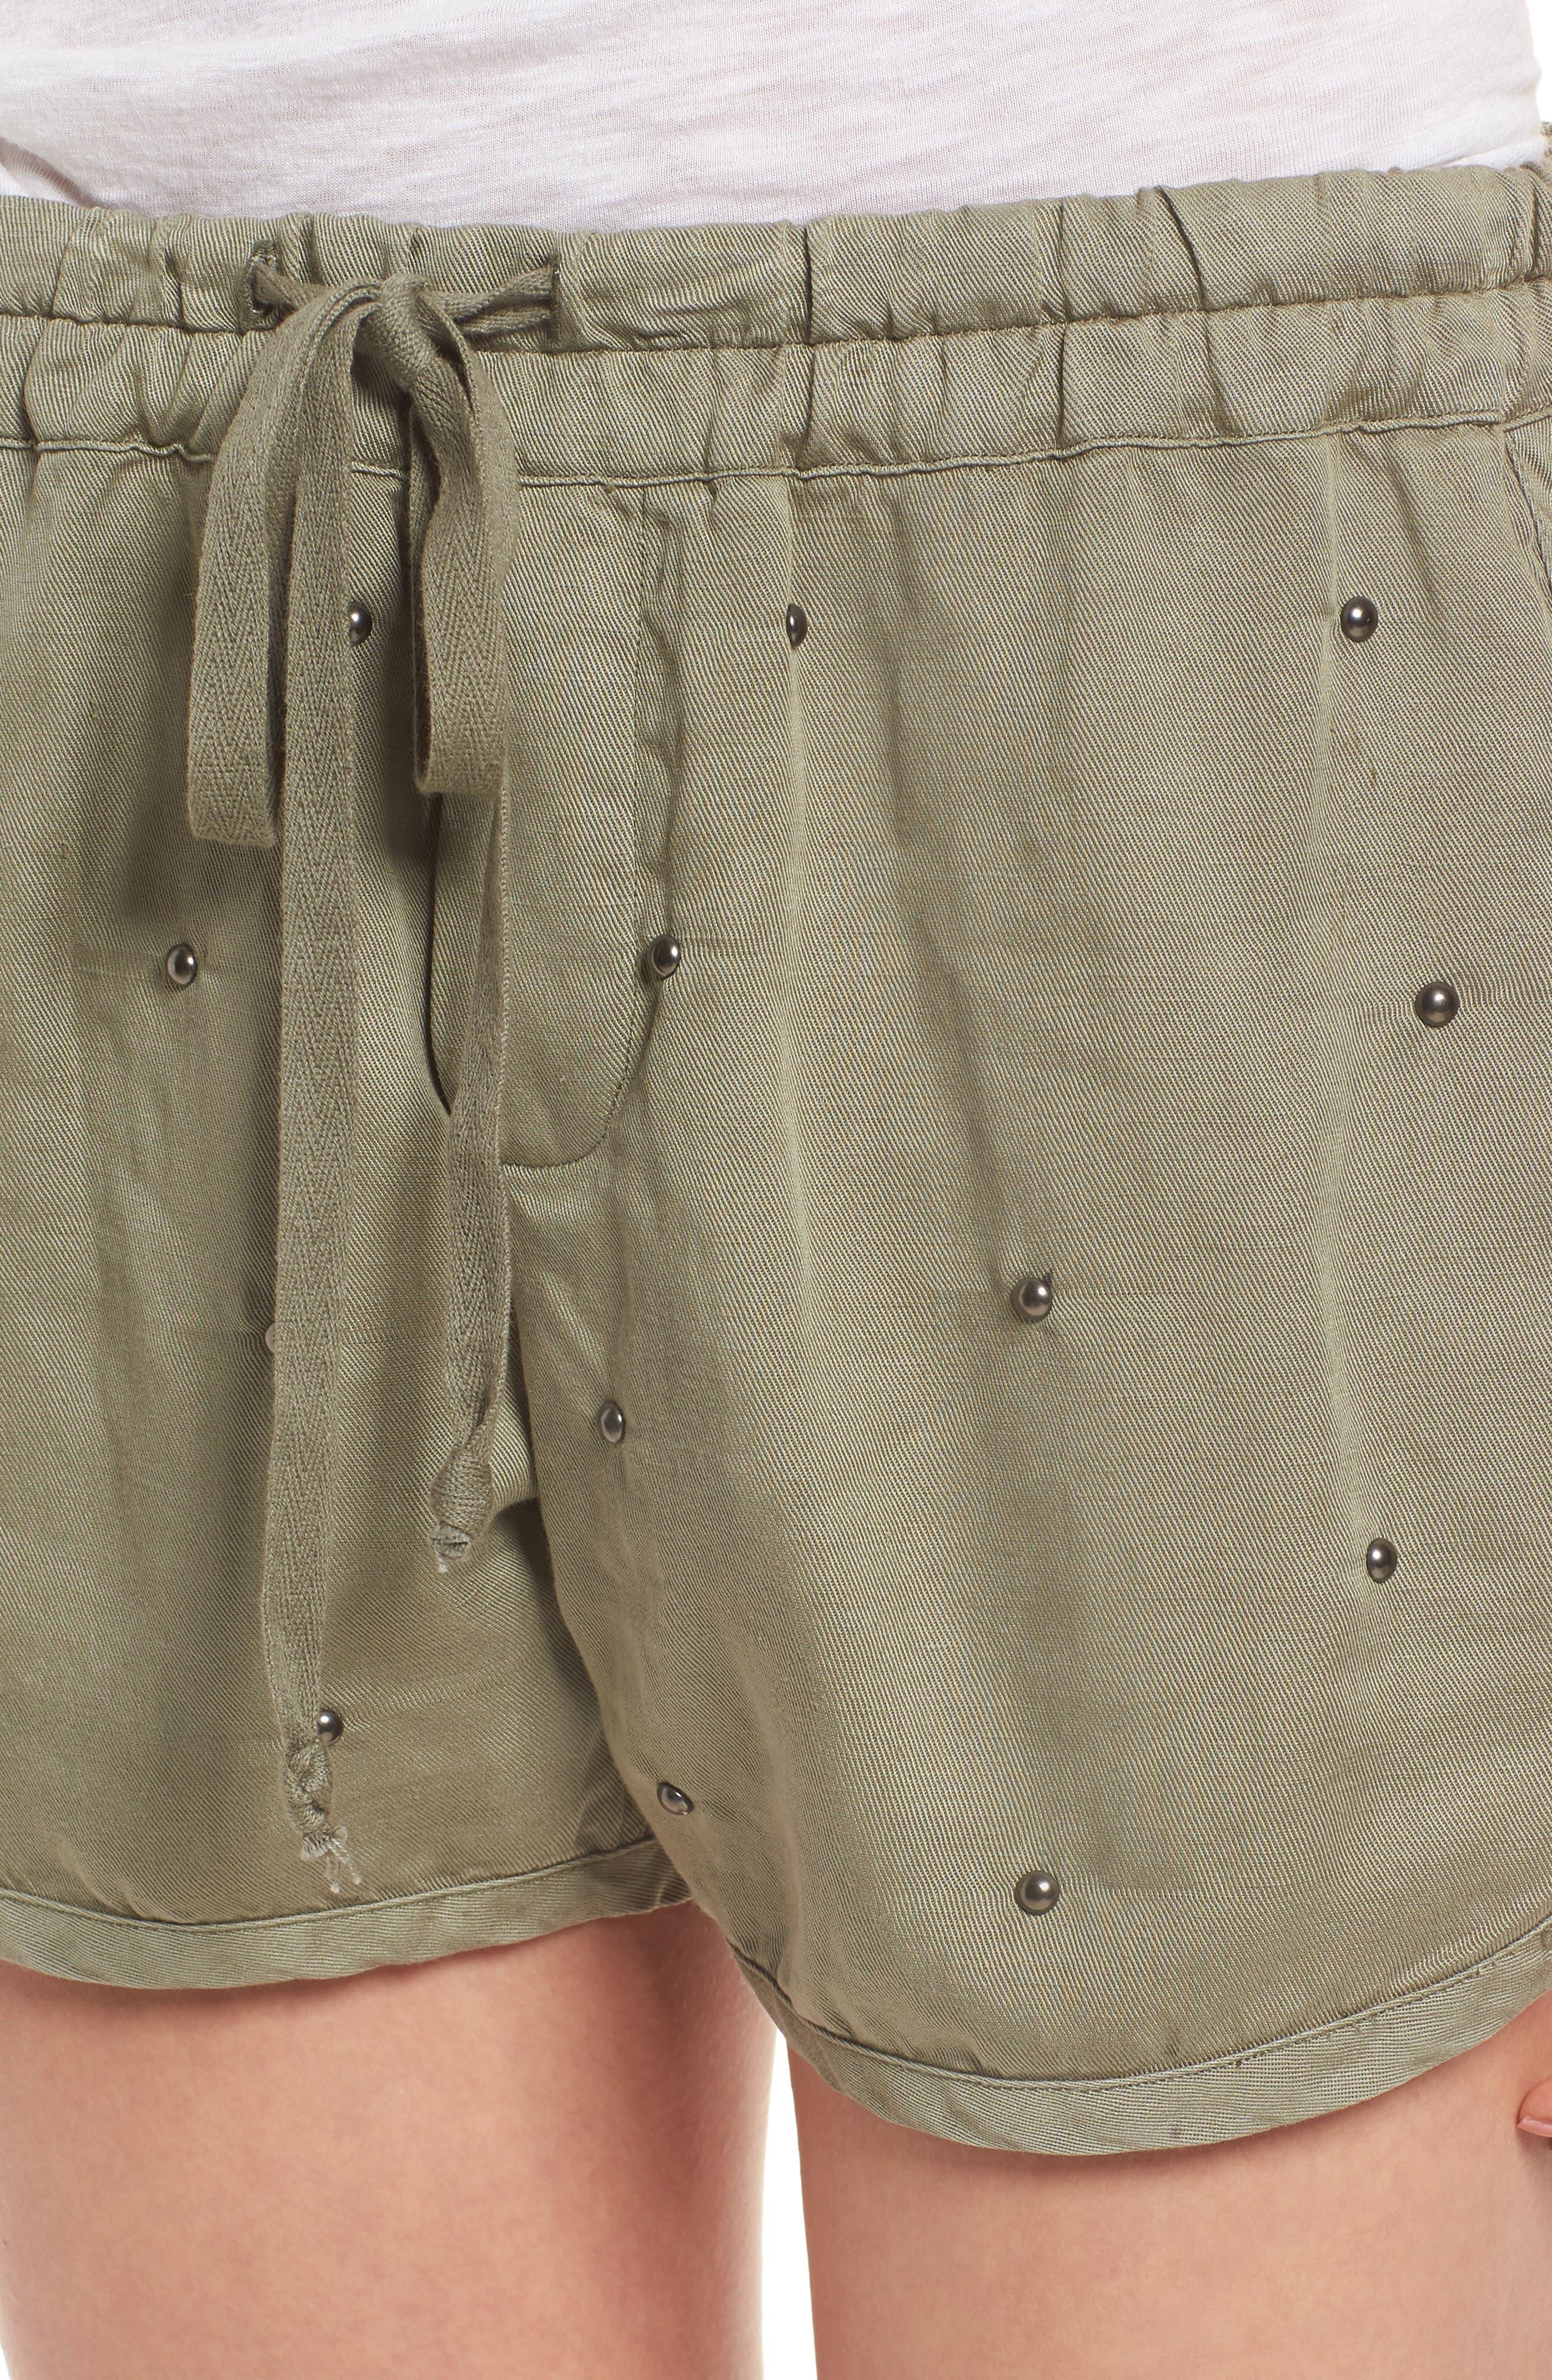 Thatcher Drawstring Shorts,                             Alternate thumbnail 4, color,                             307